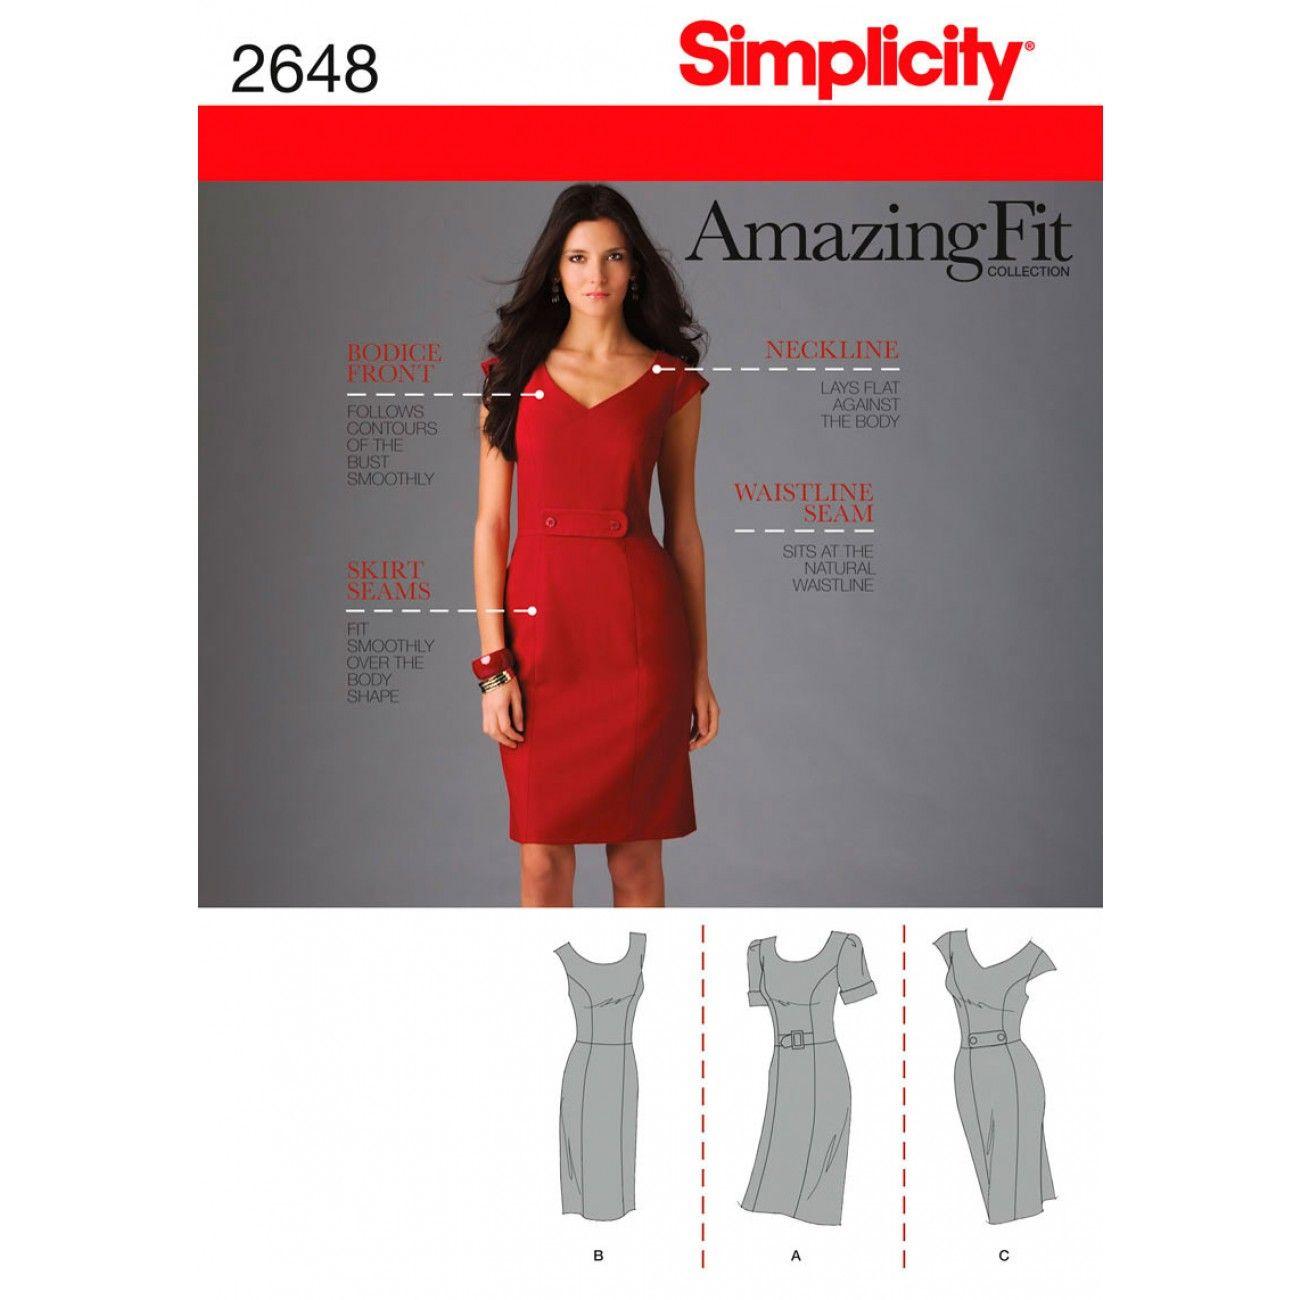 Simplicity pattern patterns fabric patterns shop online womens miss petite dress pattern 2648 simplicitypatterns for dressmaking class with black digital rose print lining jeuxipadfo Gallery